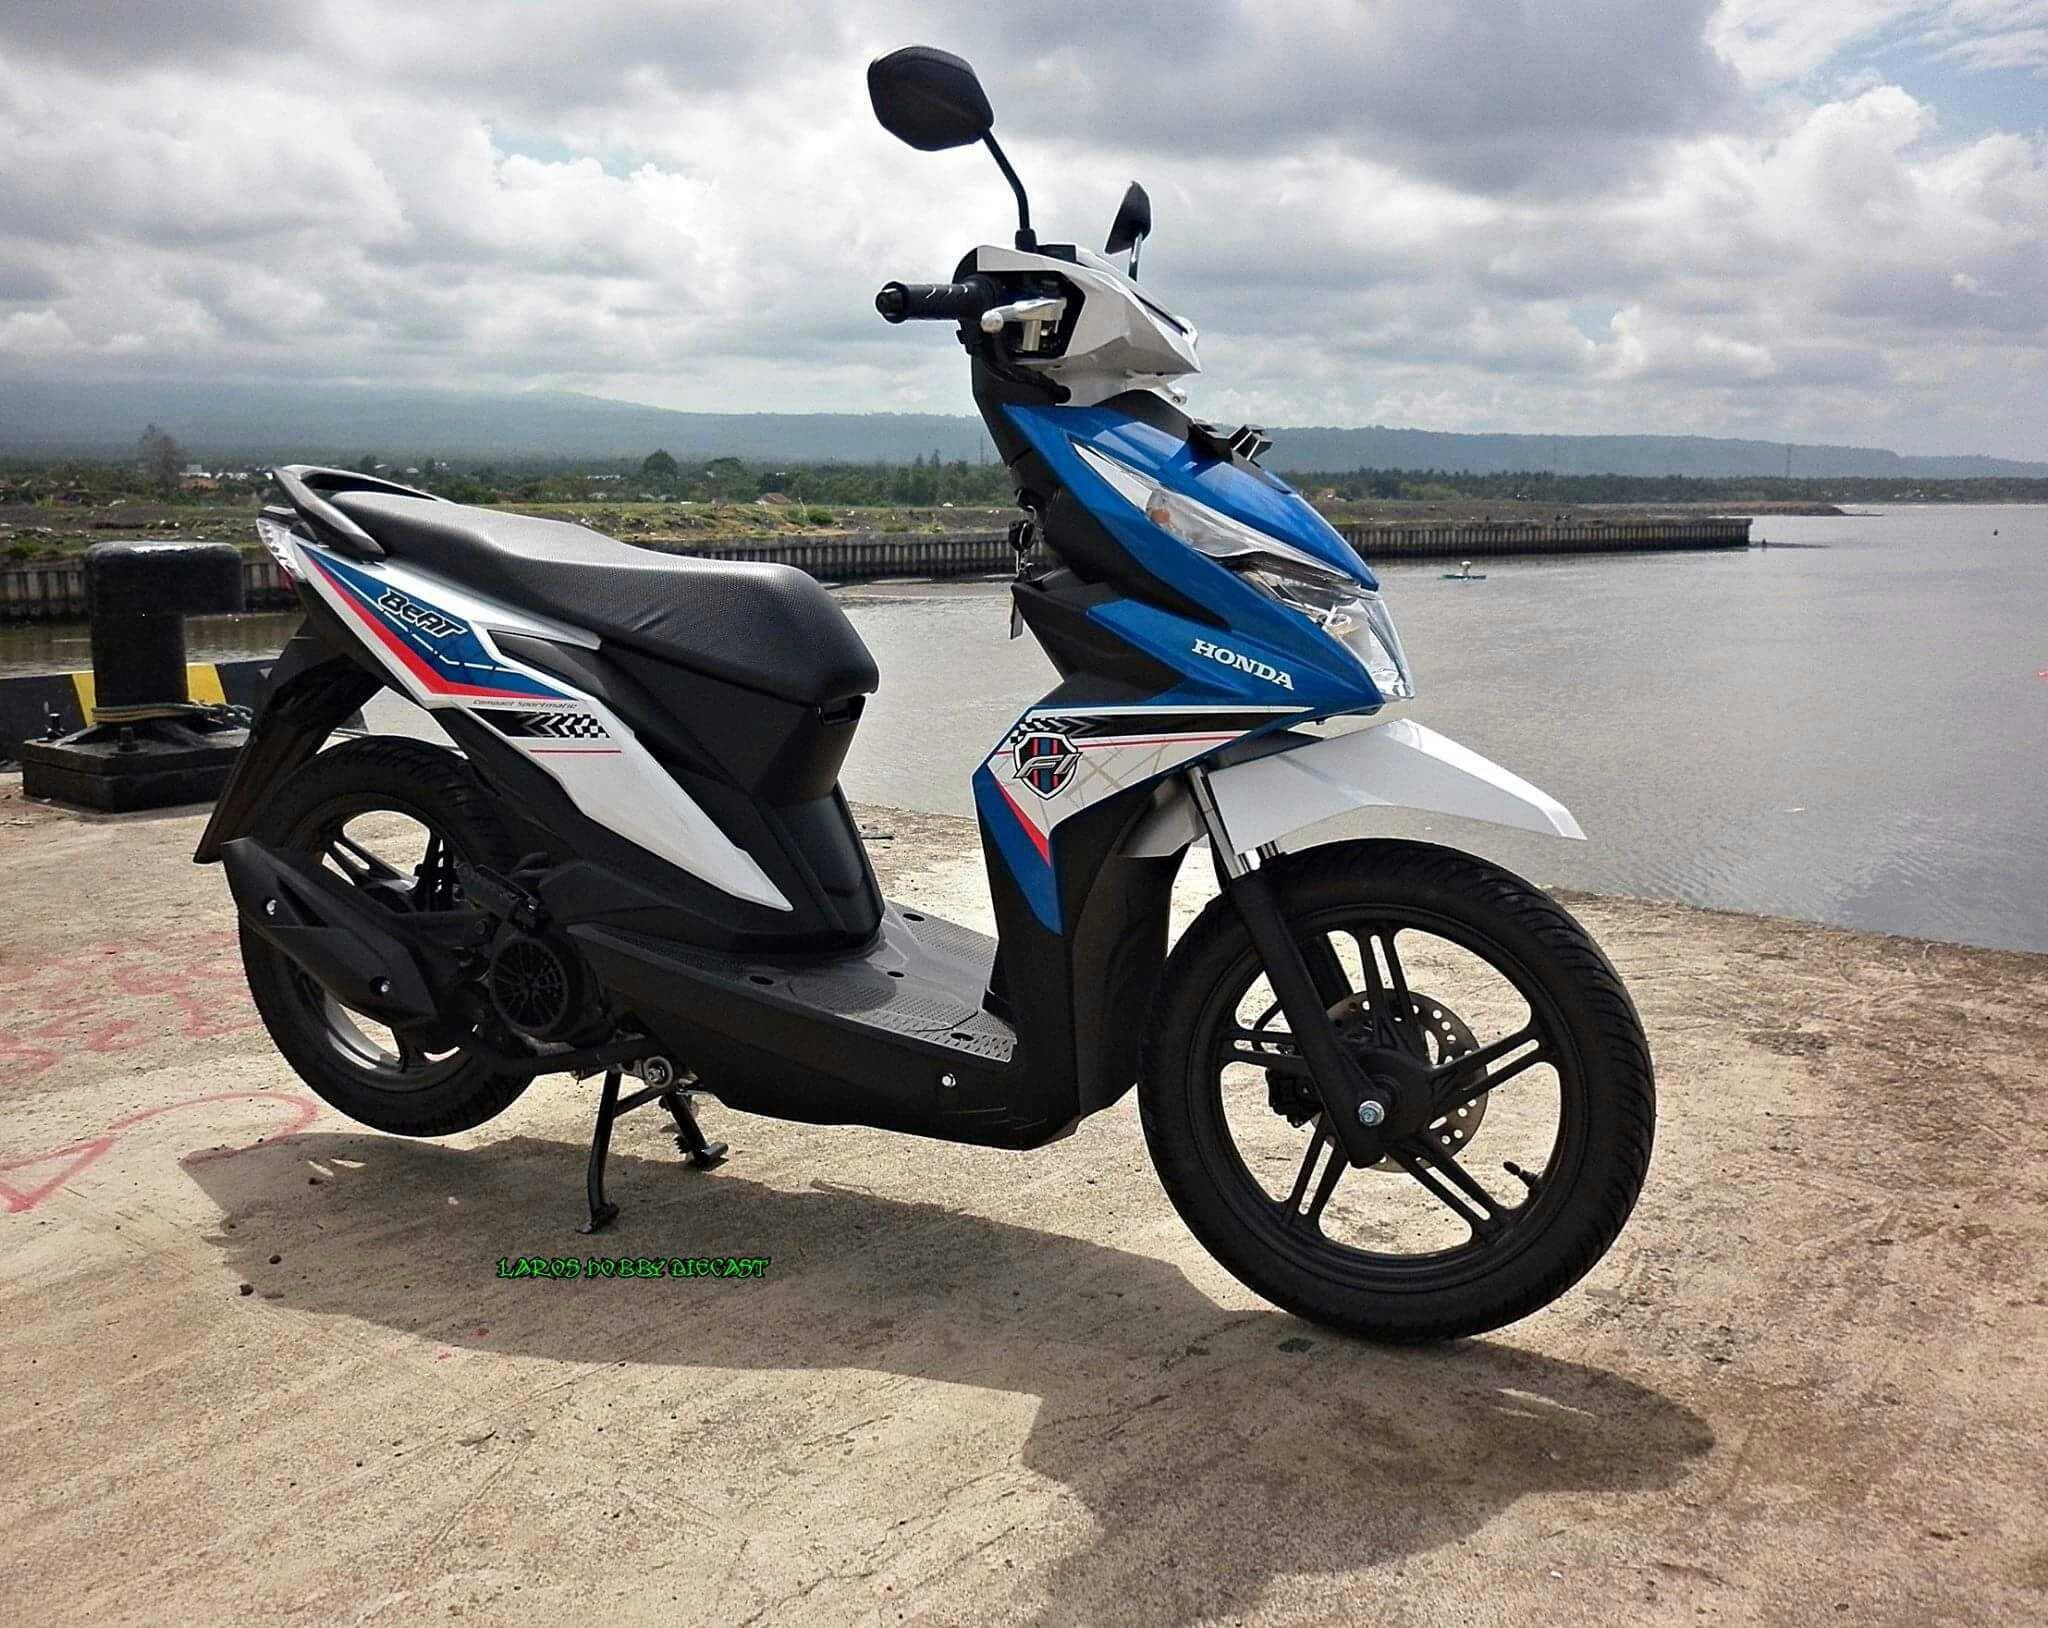 Harga Jual Honda New Beat Navi Vs Grom Comparison Why All Sporty Esp Cbs Iss Electro Blue White Kota Semarang Modifikasi Motor